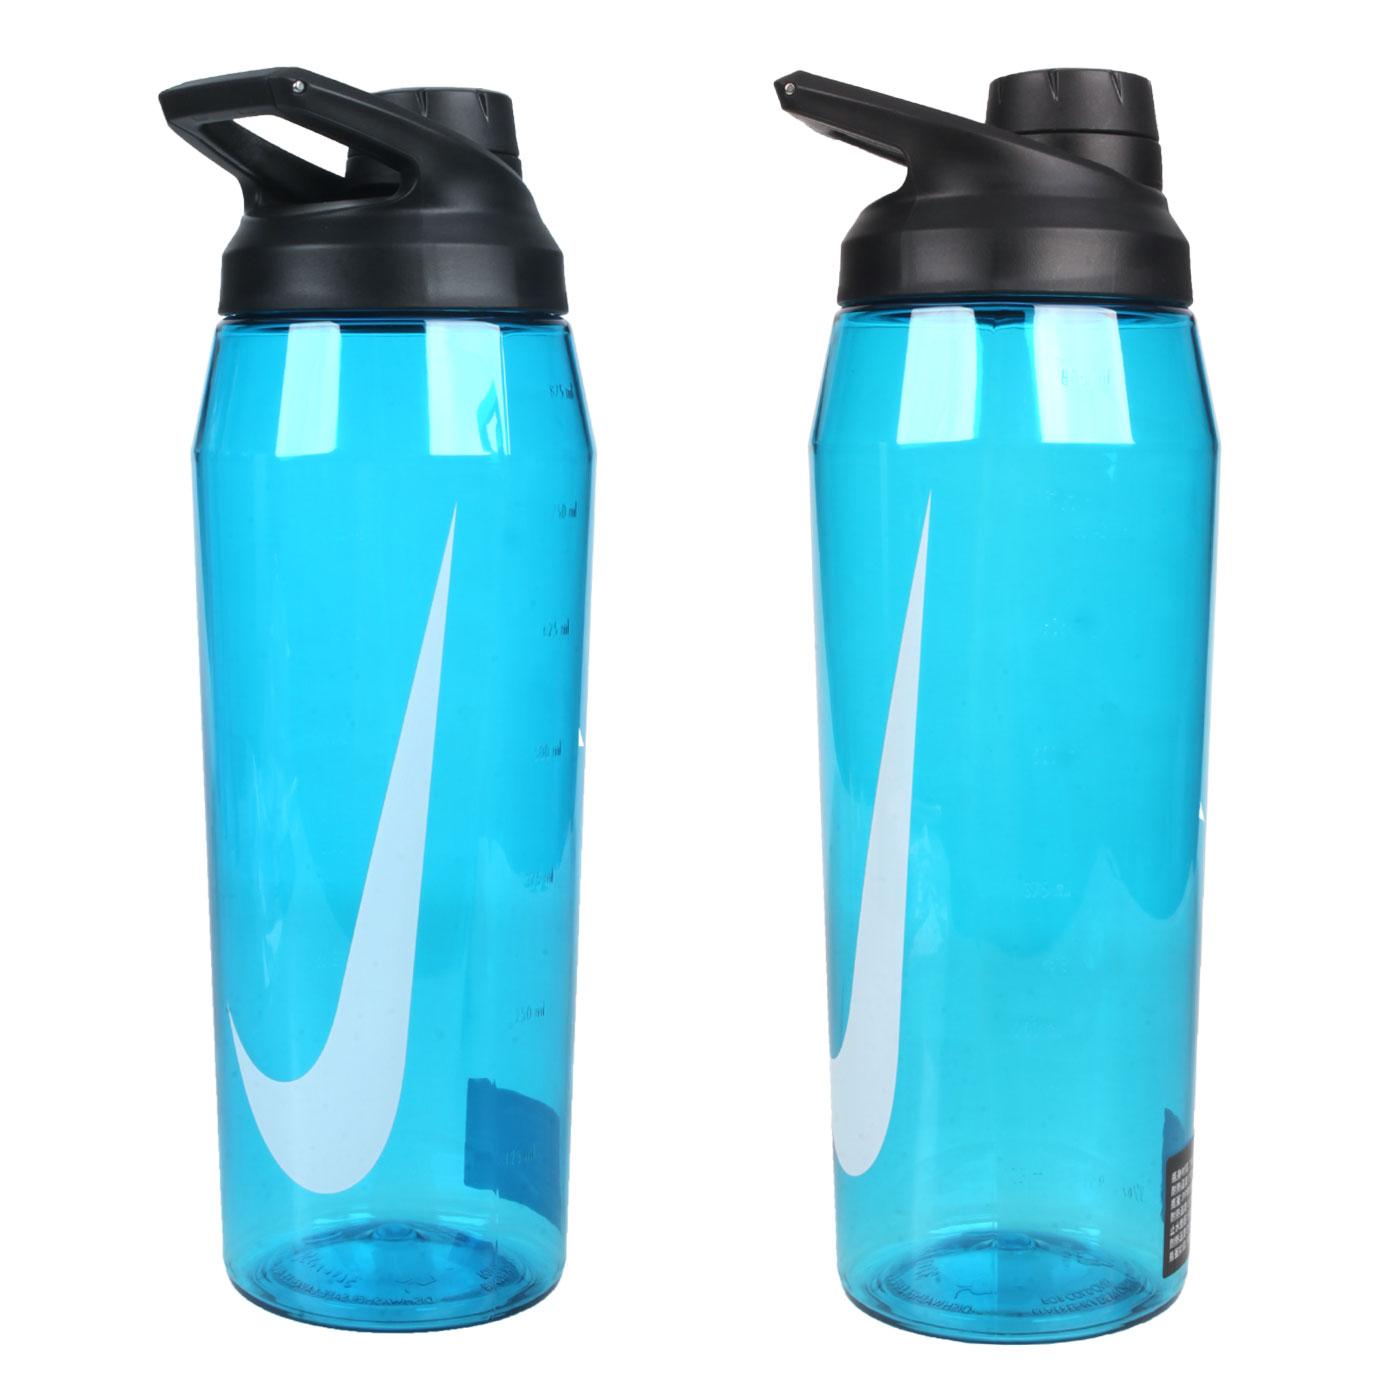 NIKE 32OZ 大口徑水壺 N100062302532 - 藍白